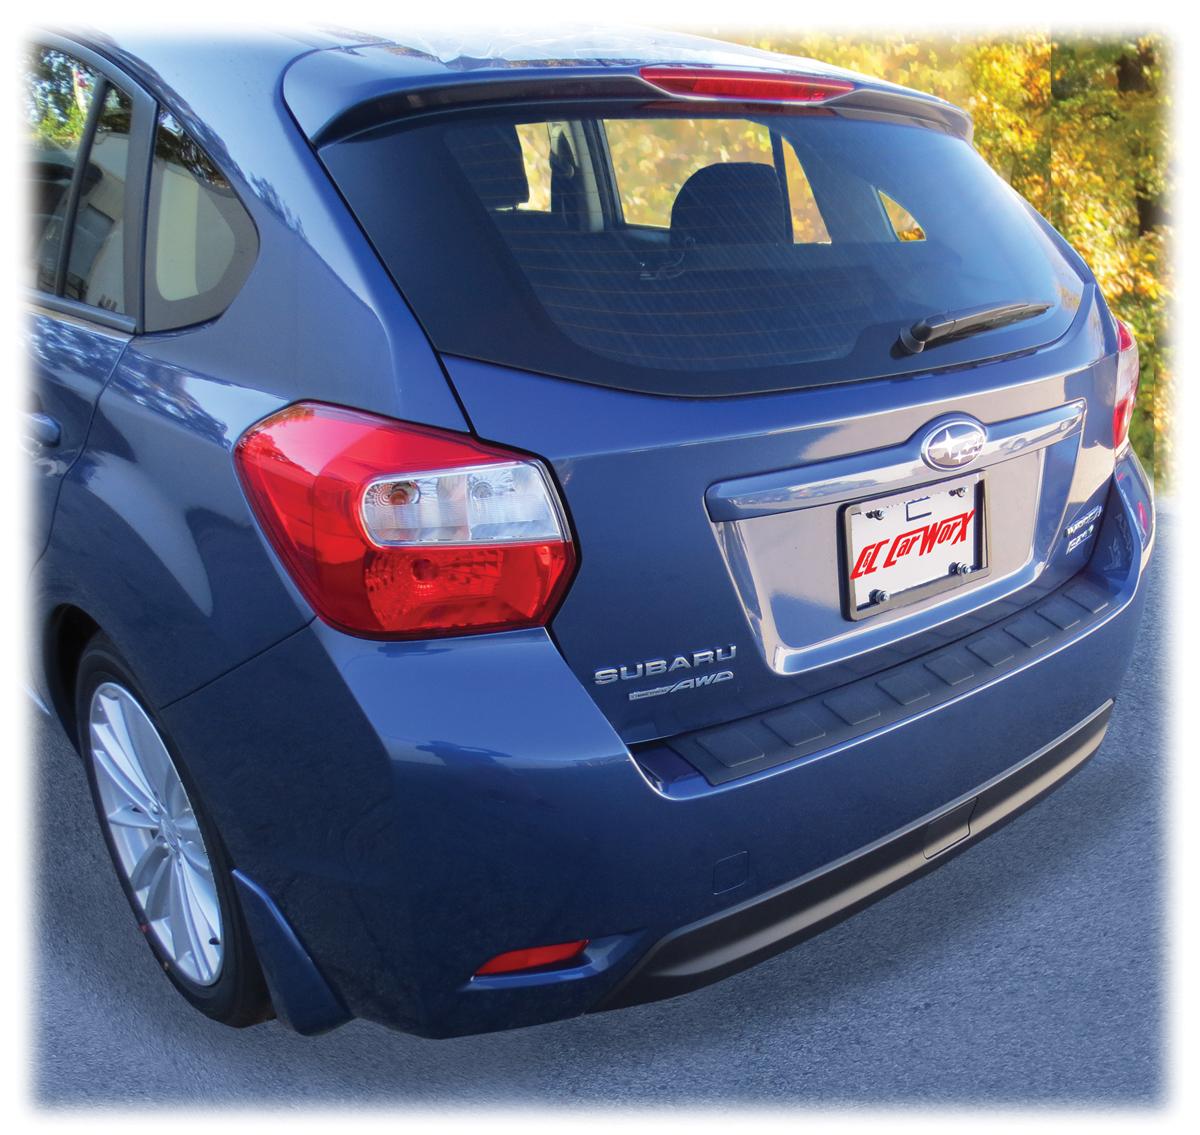 Subaru Rear Bumper Cover Guard Pad Protection For 2012 2013 2014 2015 2016 Subaru Impreza 5 Door Hatchback Wagon At Mycarworx Com